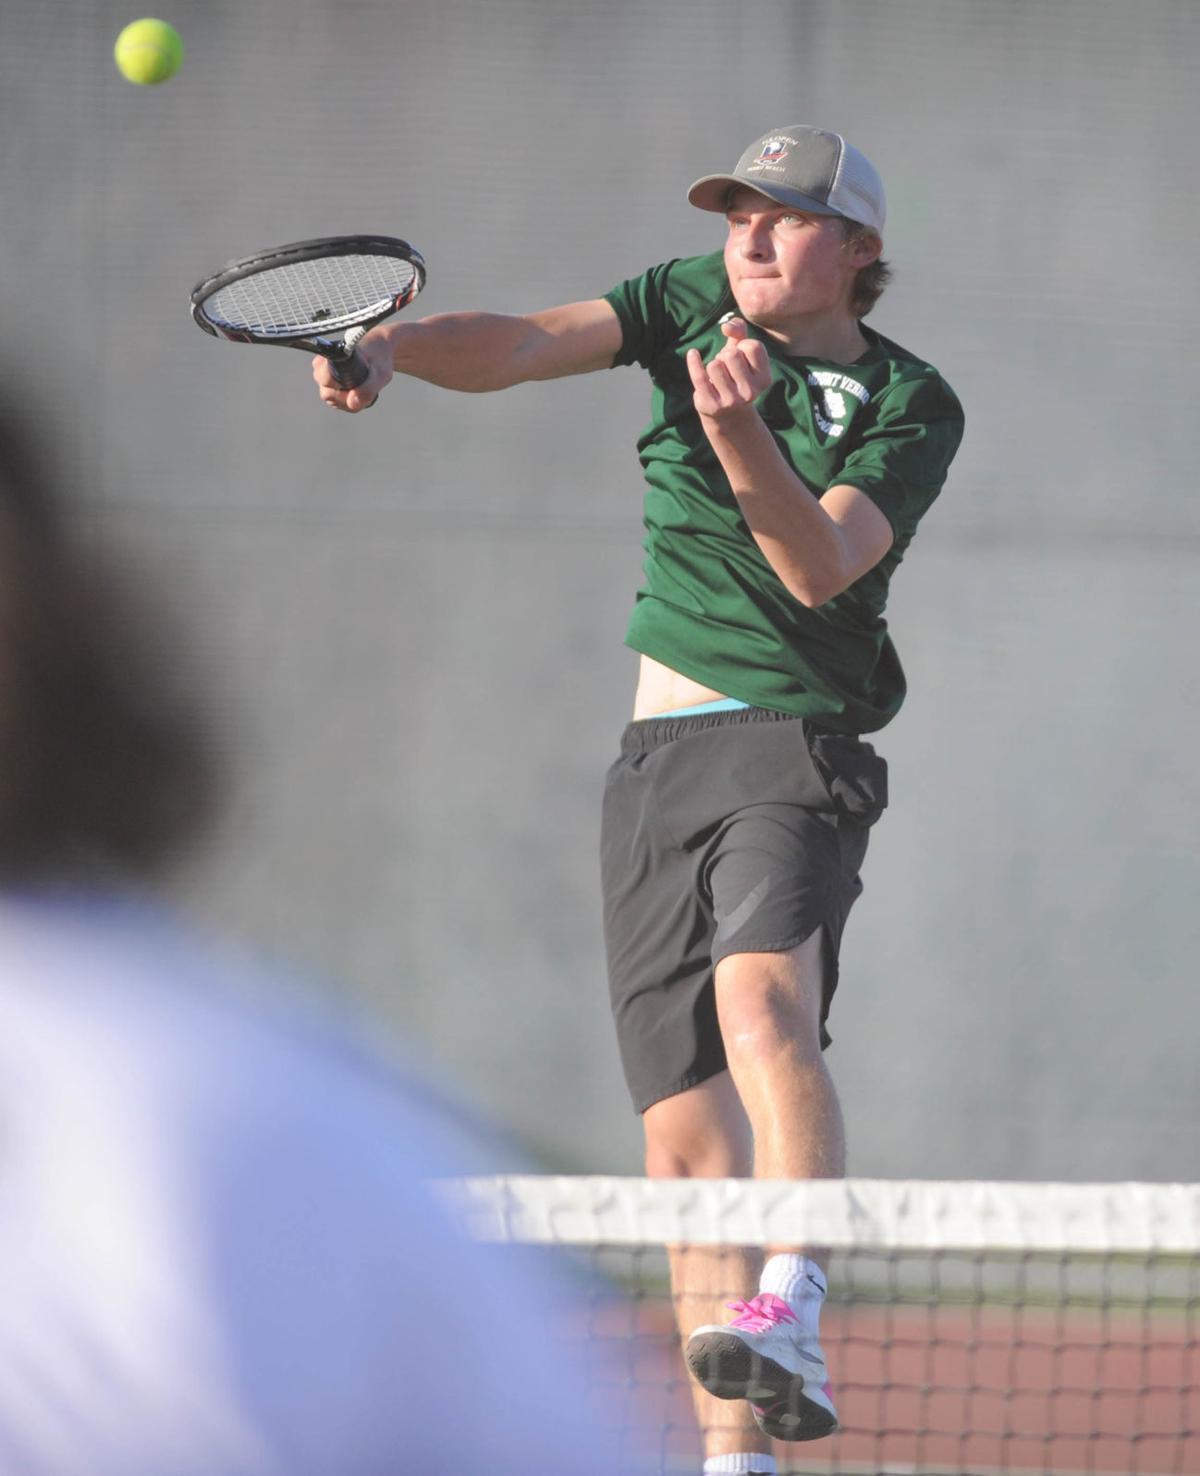 Mount Vernon Tennis